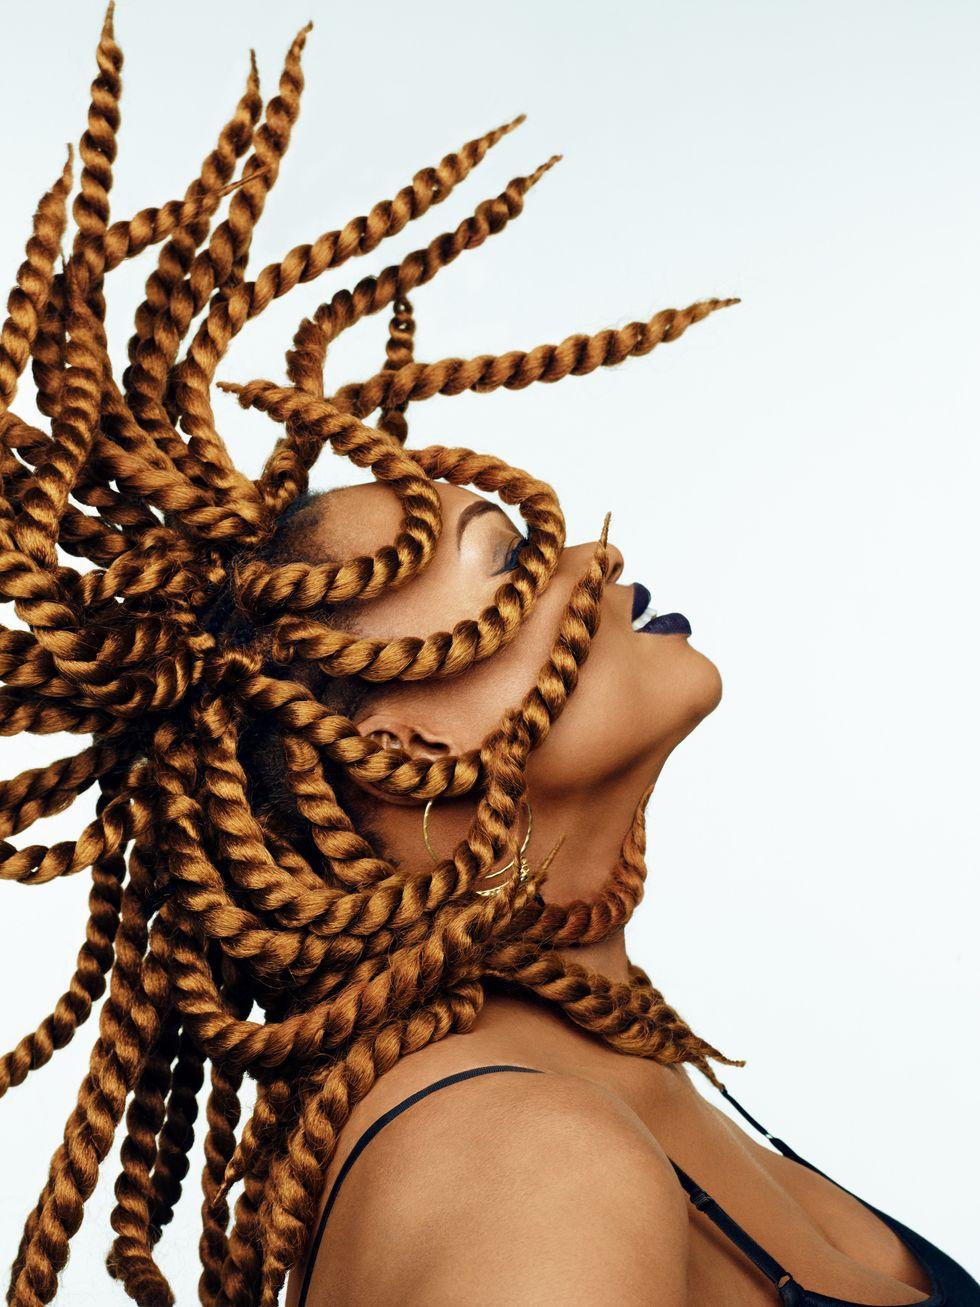 u200bOumou Sangaru00e9 throwing her head back, braids in the air.